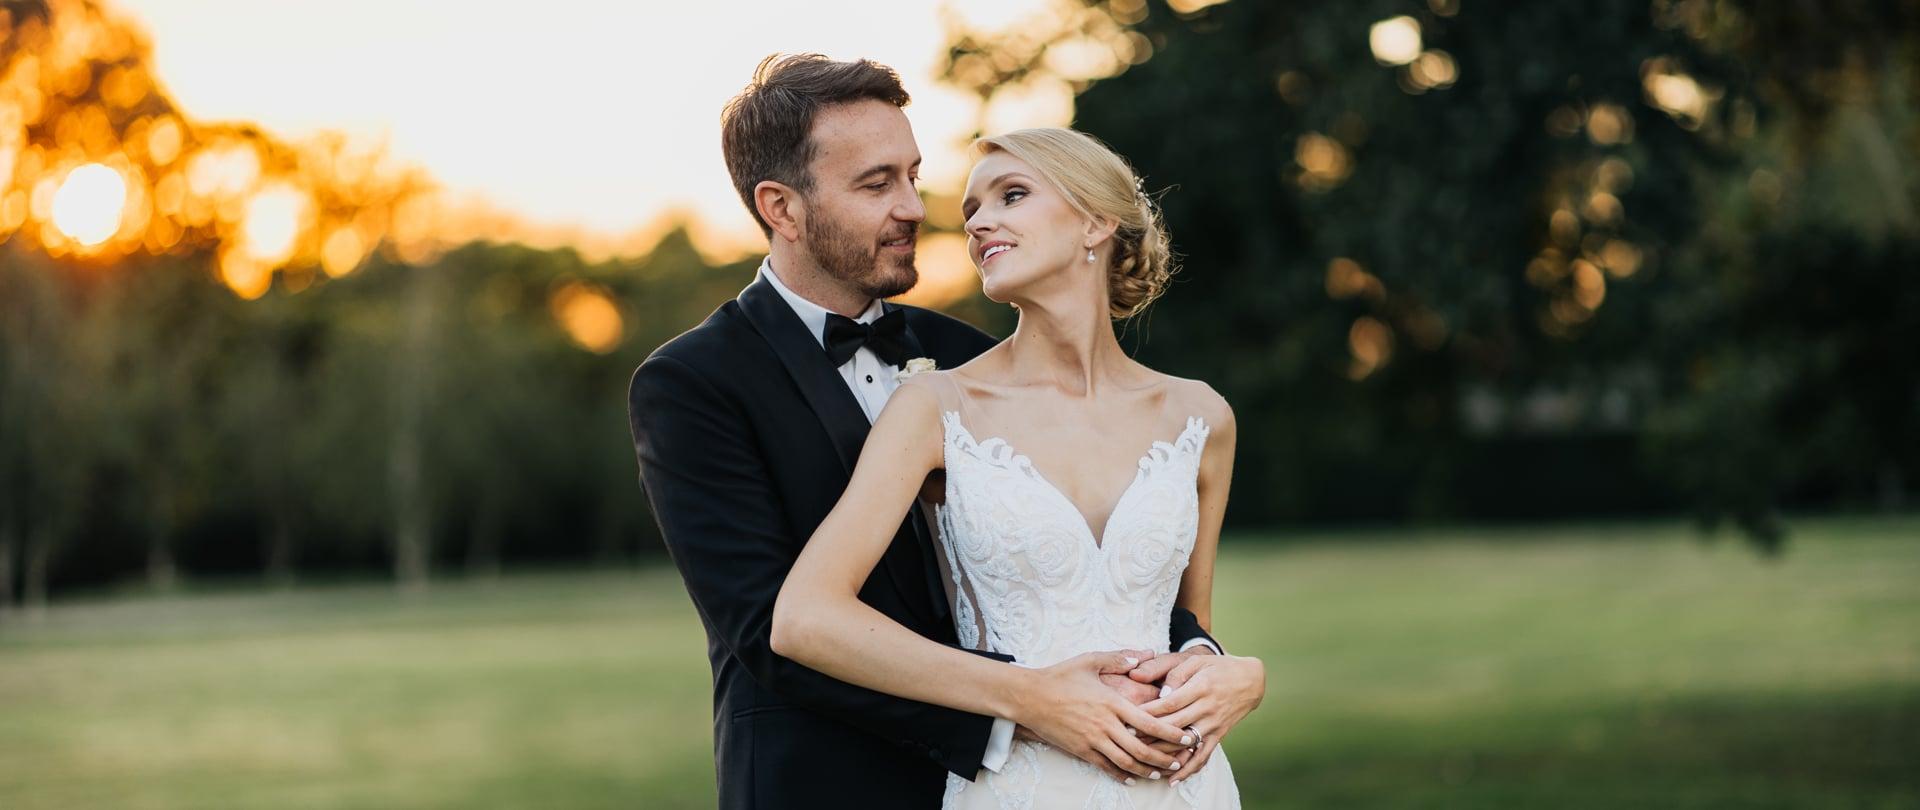 Sophie & Harrison Wedding Video Filmed at Yarra Valley, Victoria